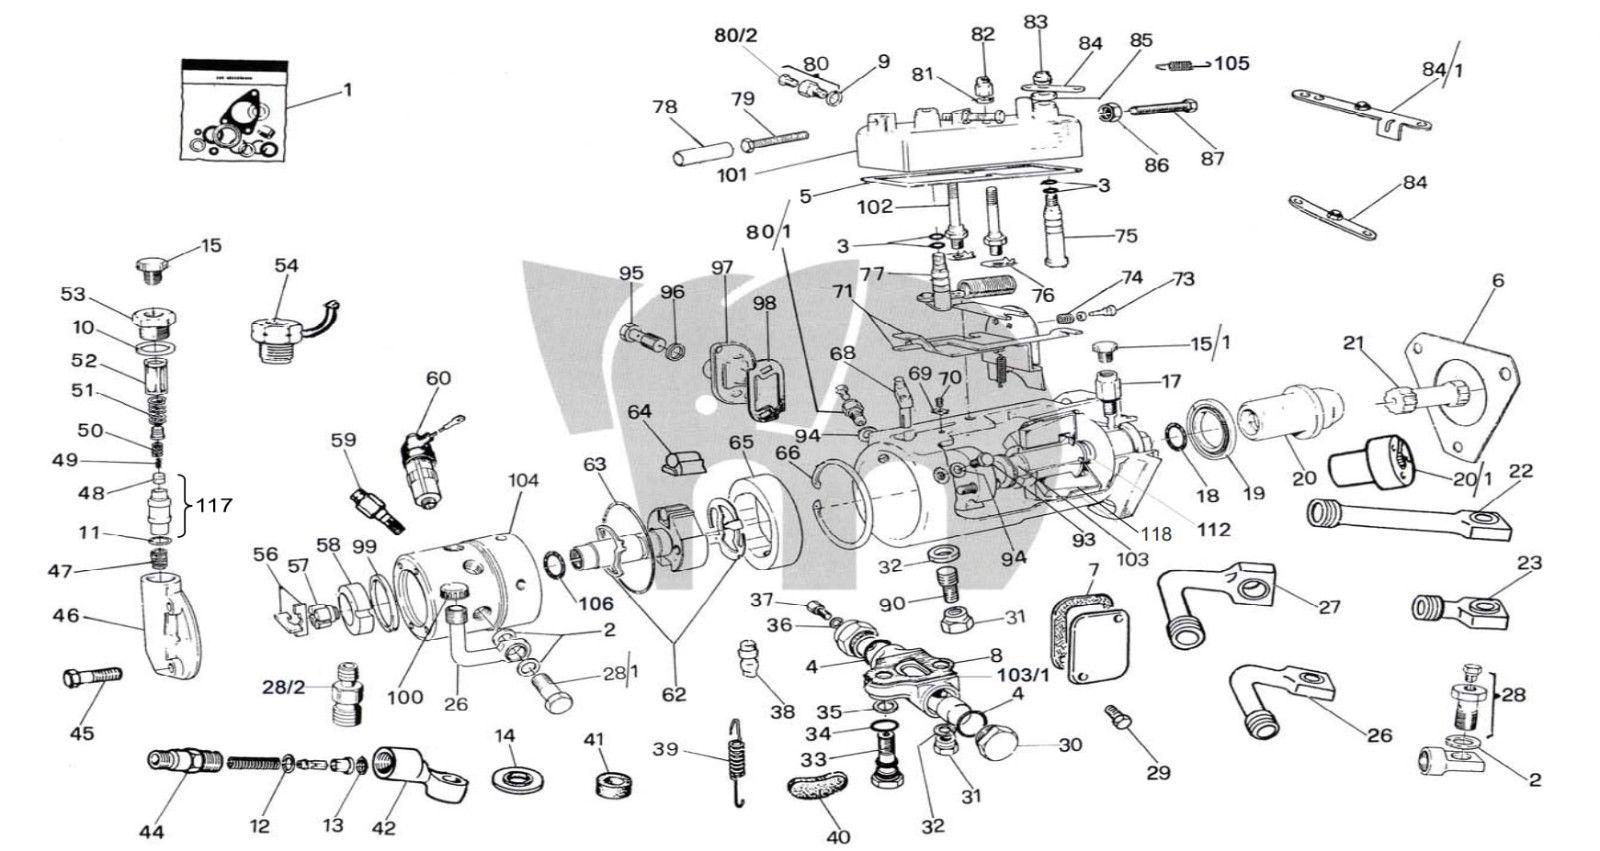 Cav Lucas Delphi Dpasel Pump Overhaul Kit Rebuild